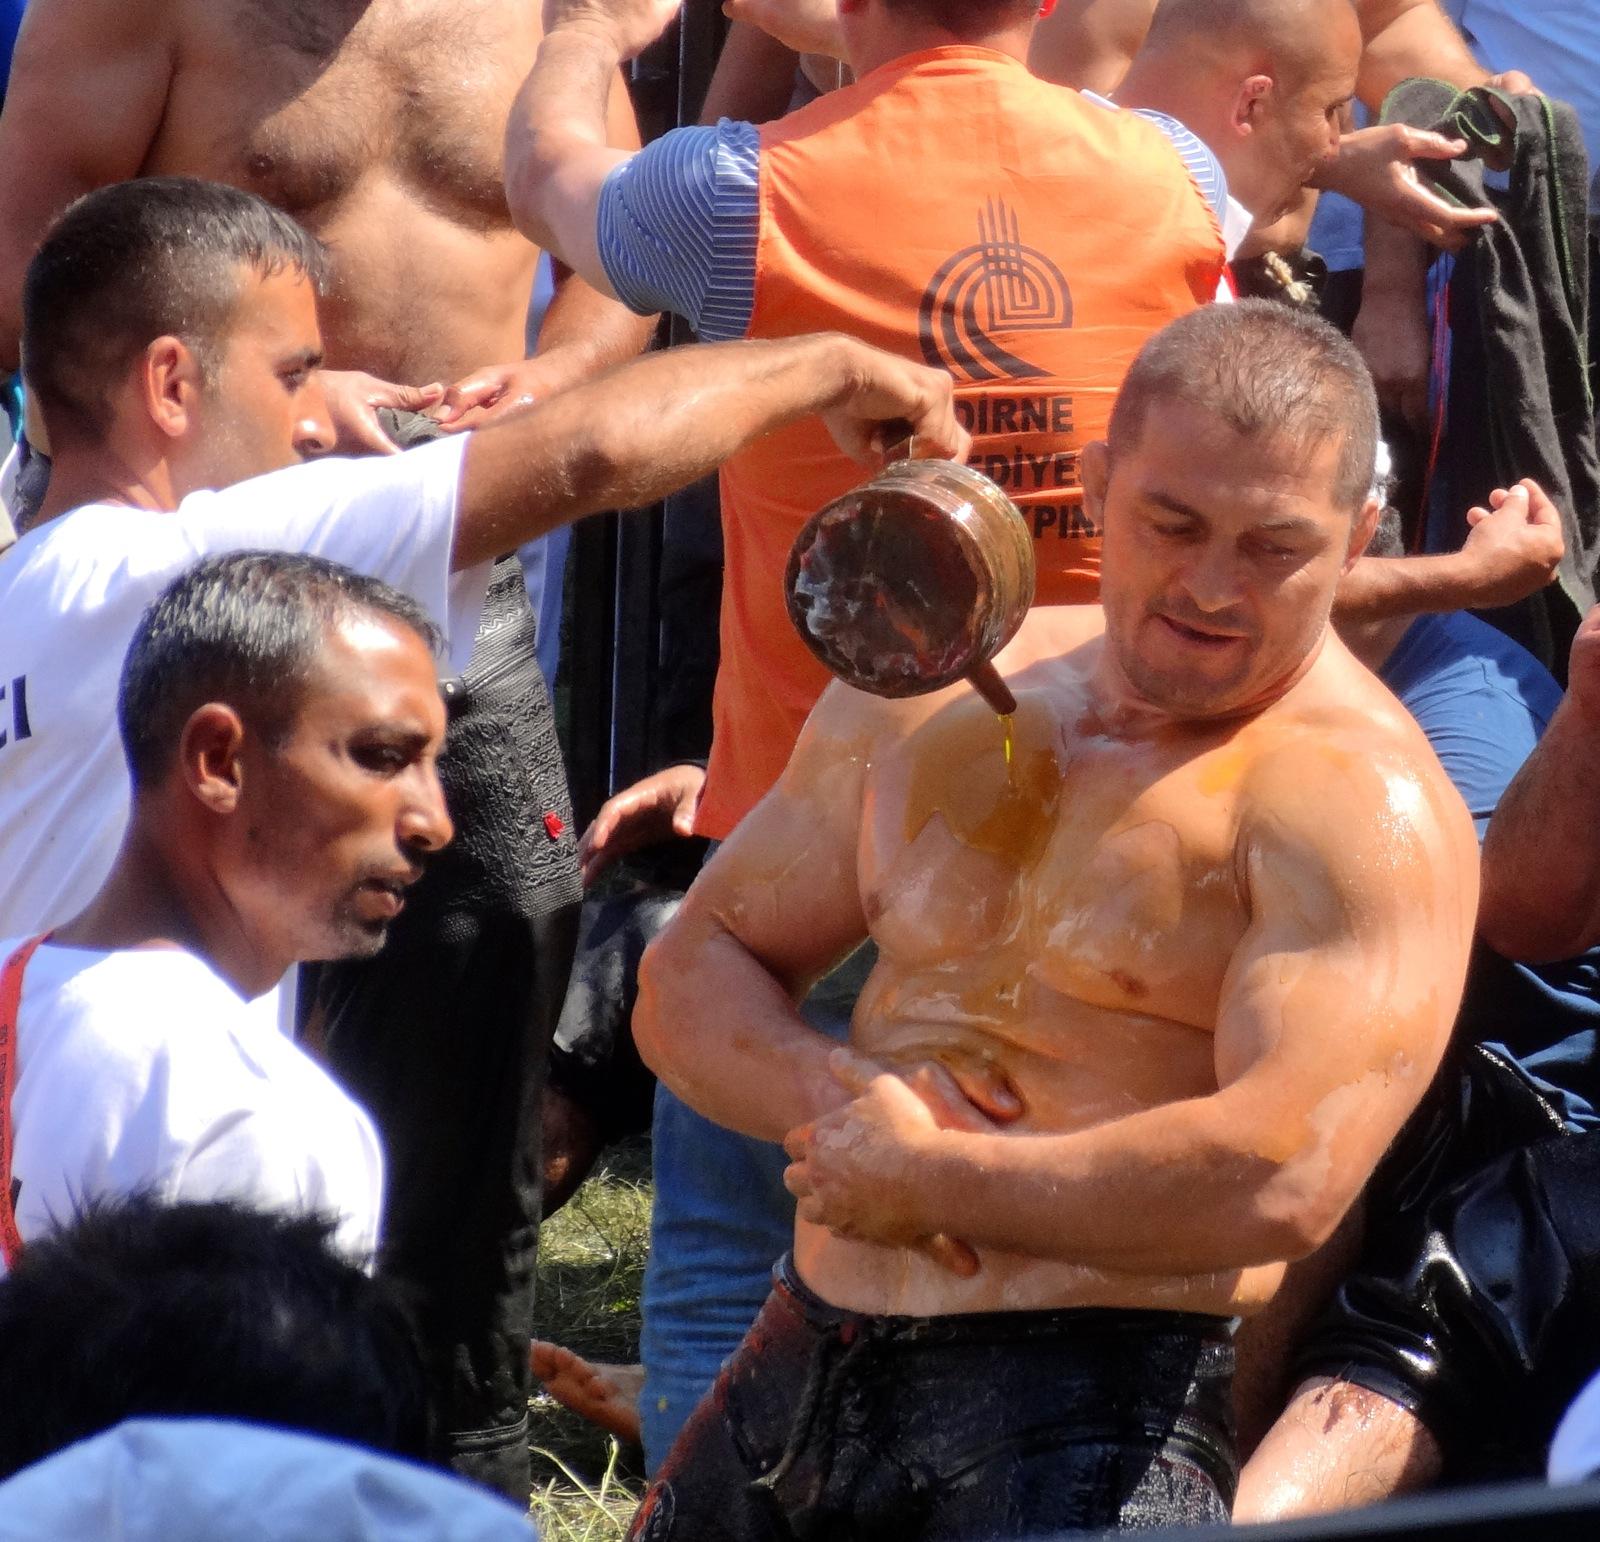 Kirkpinar Oil Wrestling 2013 Chip Conley   20